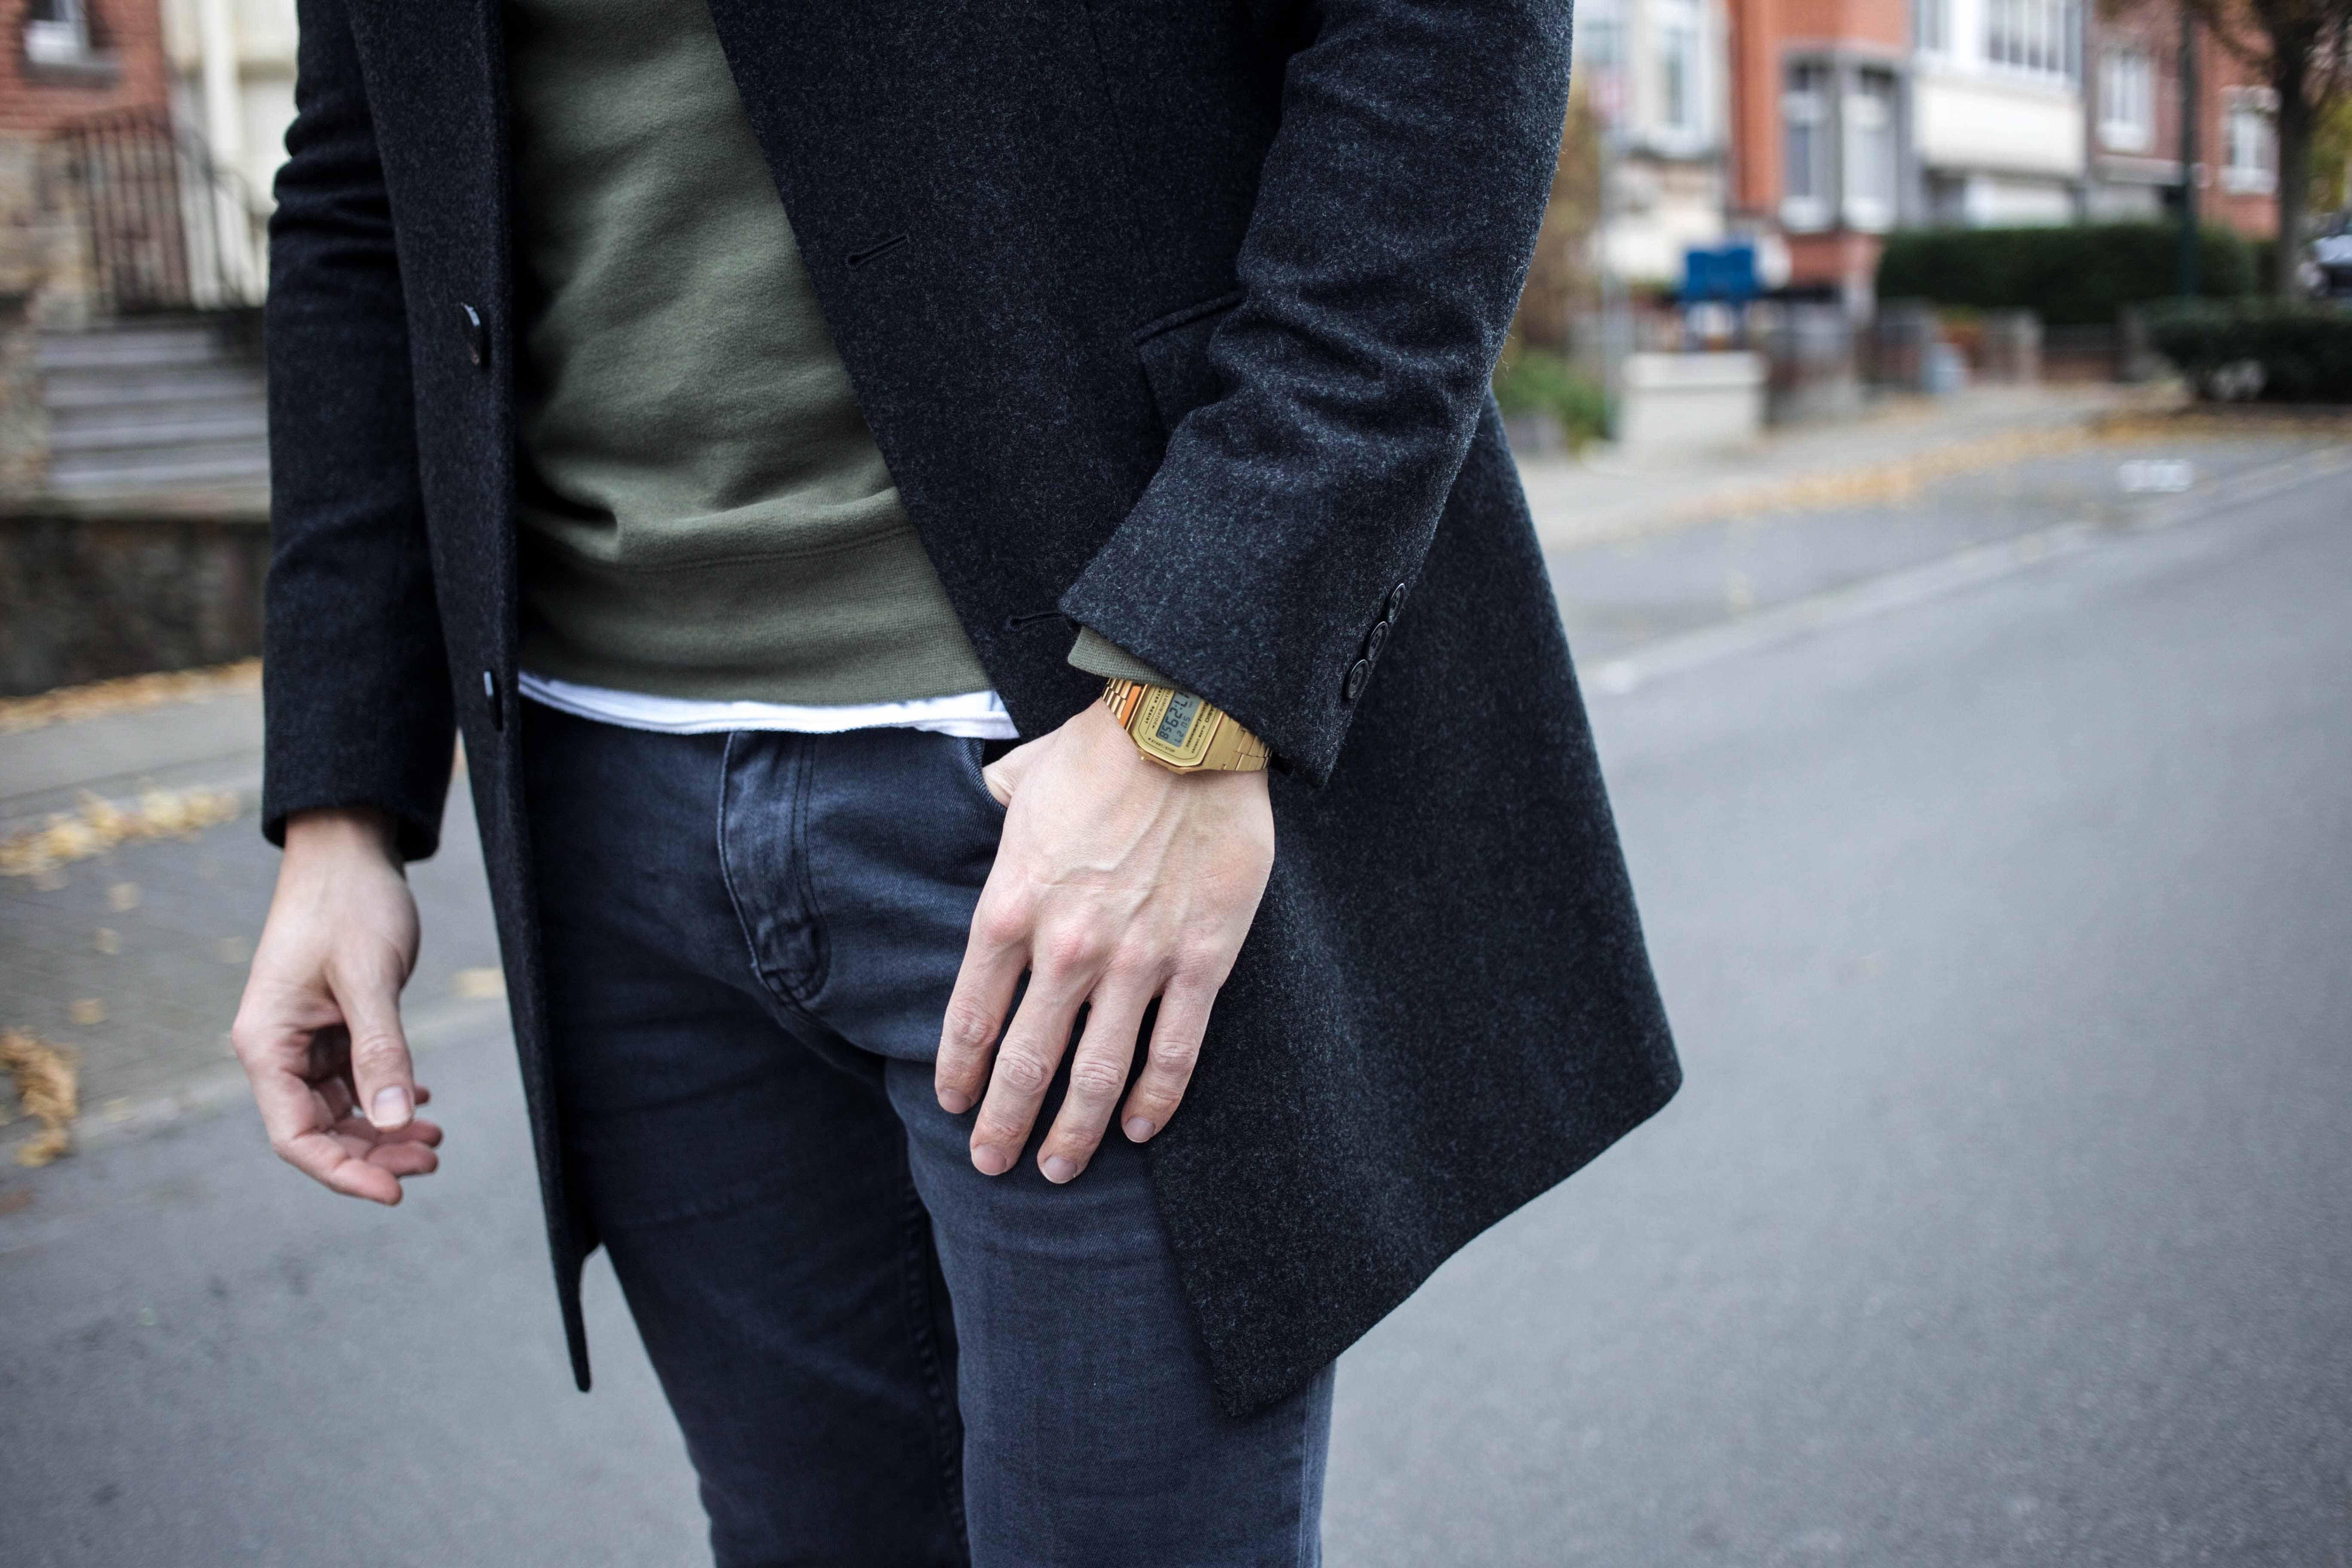 gruener-sweater-gruene-sneaker-modern-street-style-look-casio-uhr-modeblog-maennermode-berlin_8602